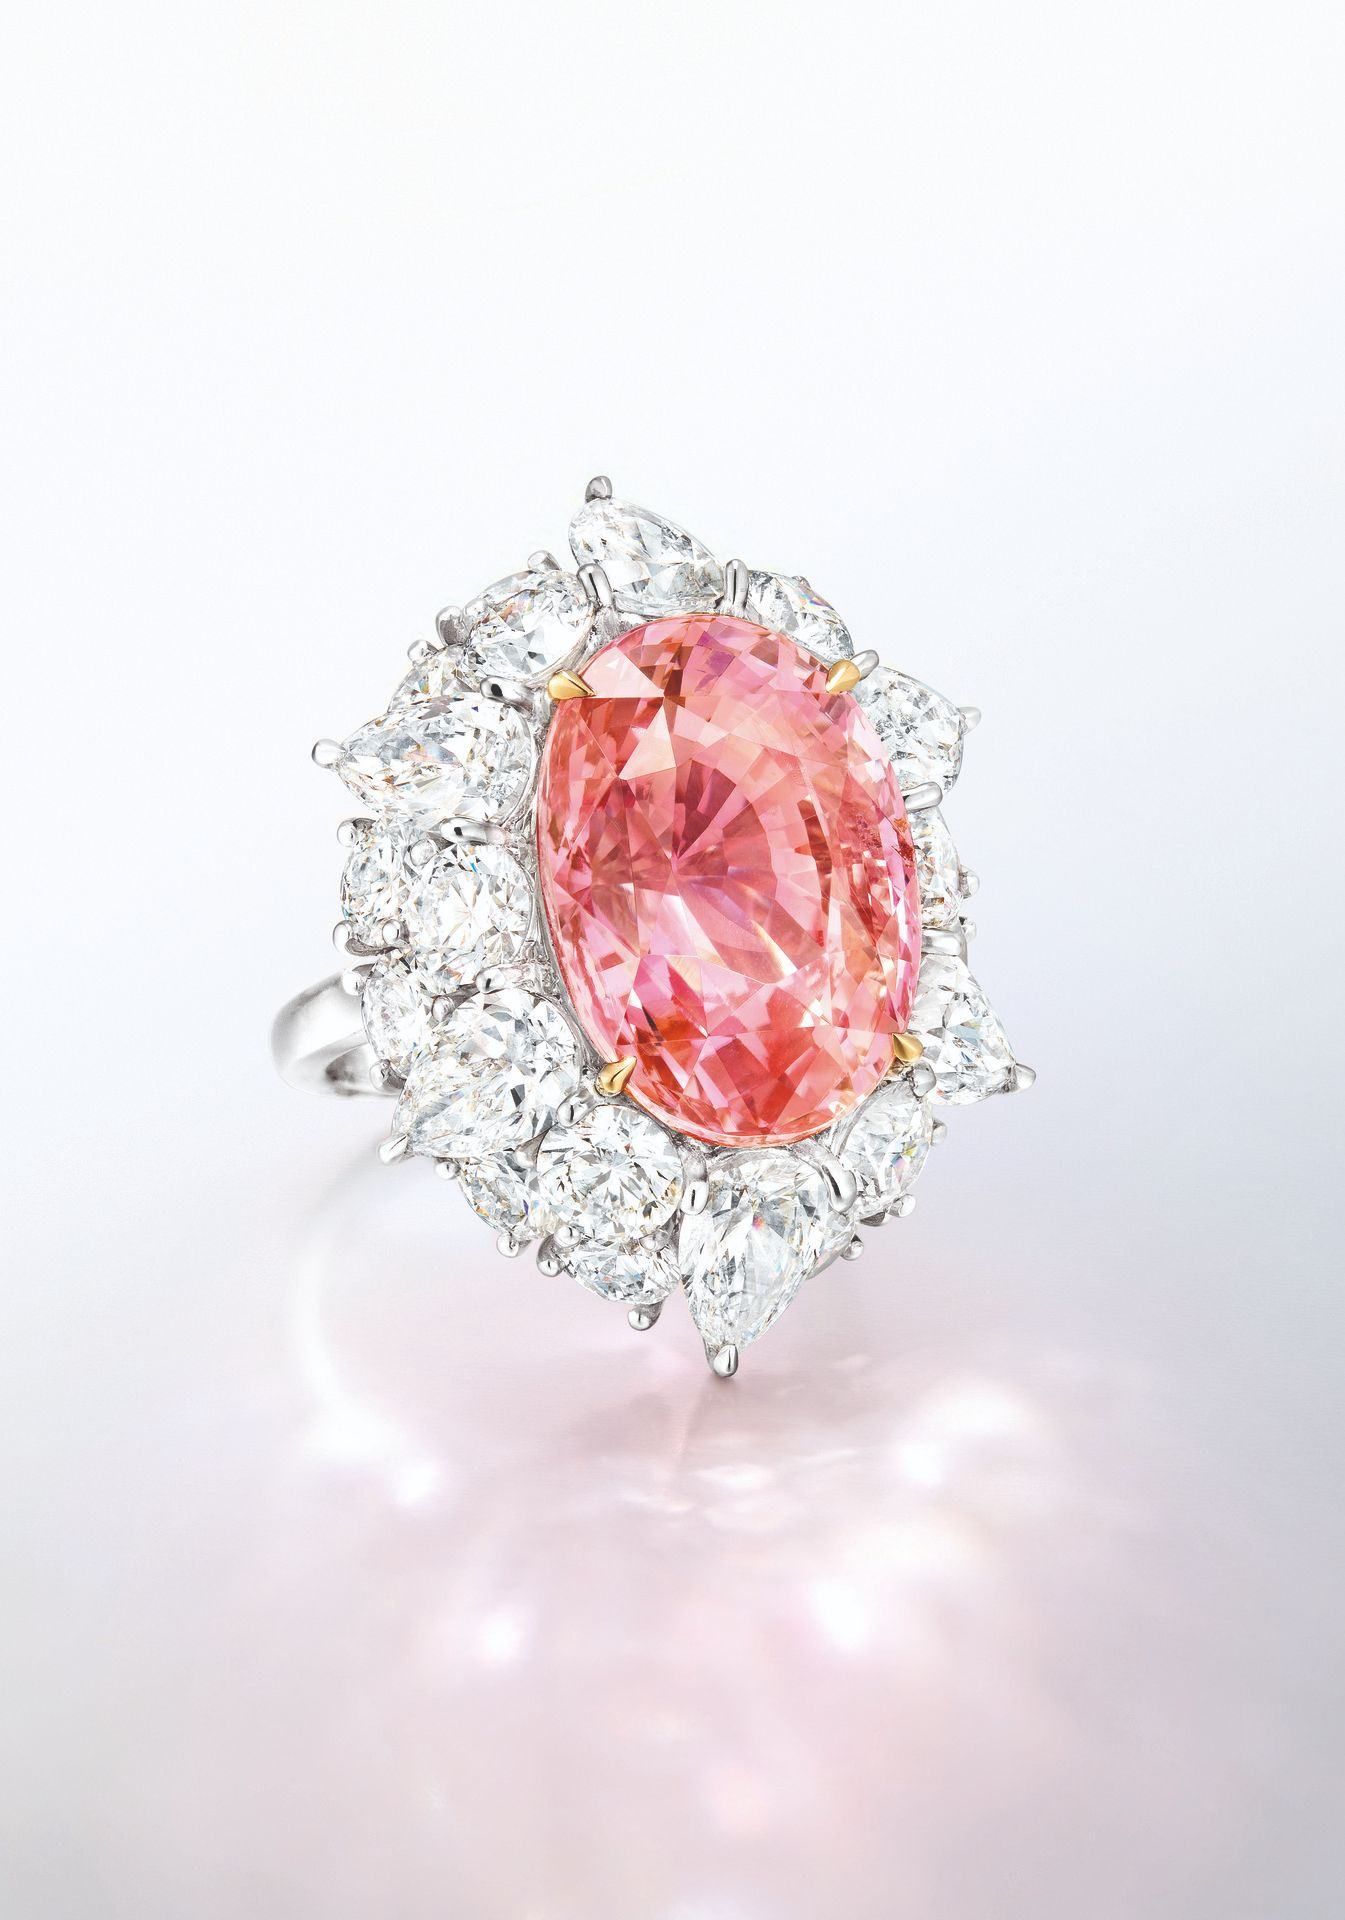 Gabrielleus amazing fantasy closet a carat unheated sri